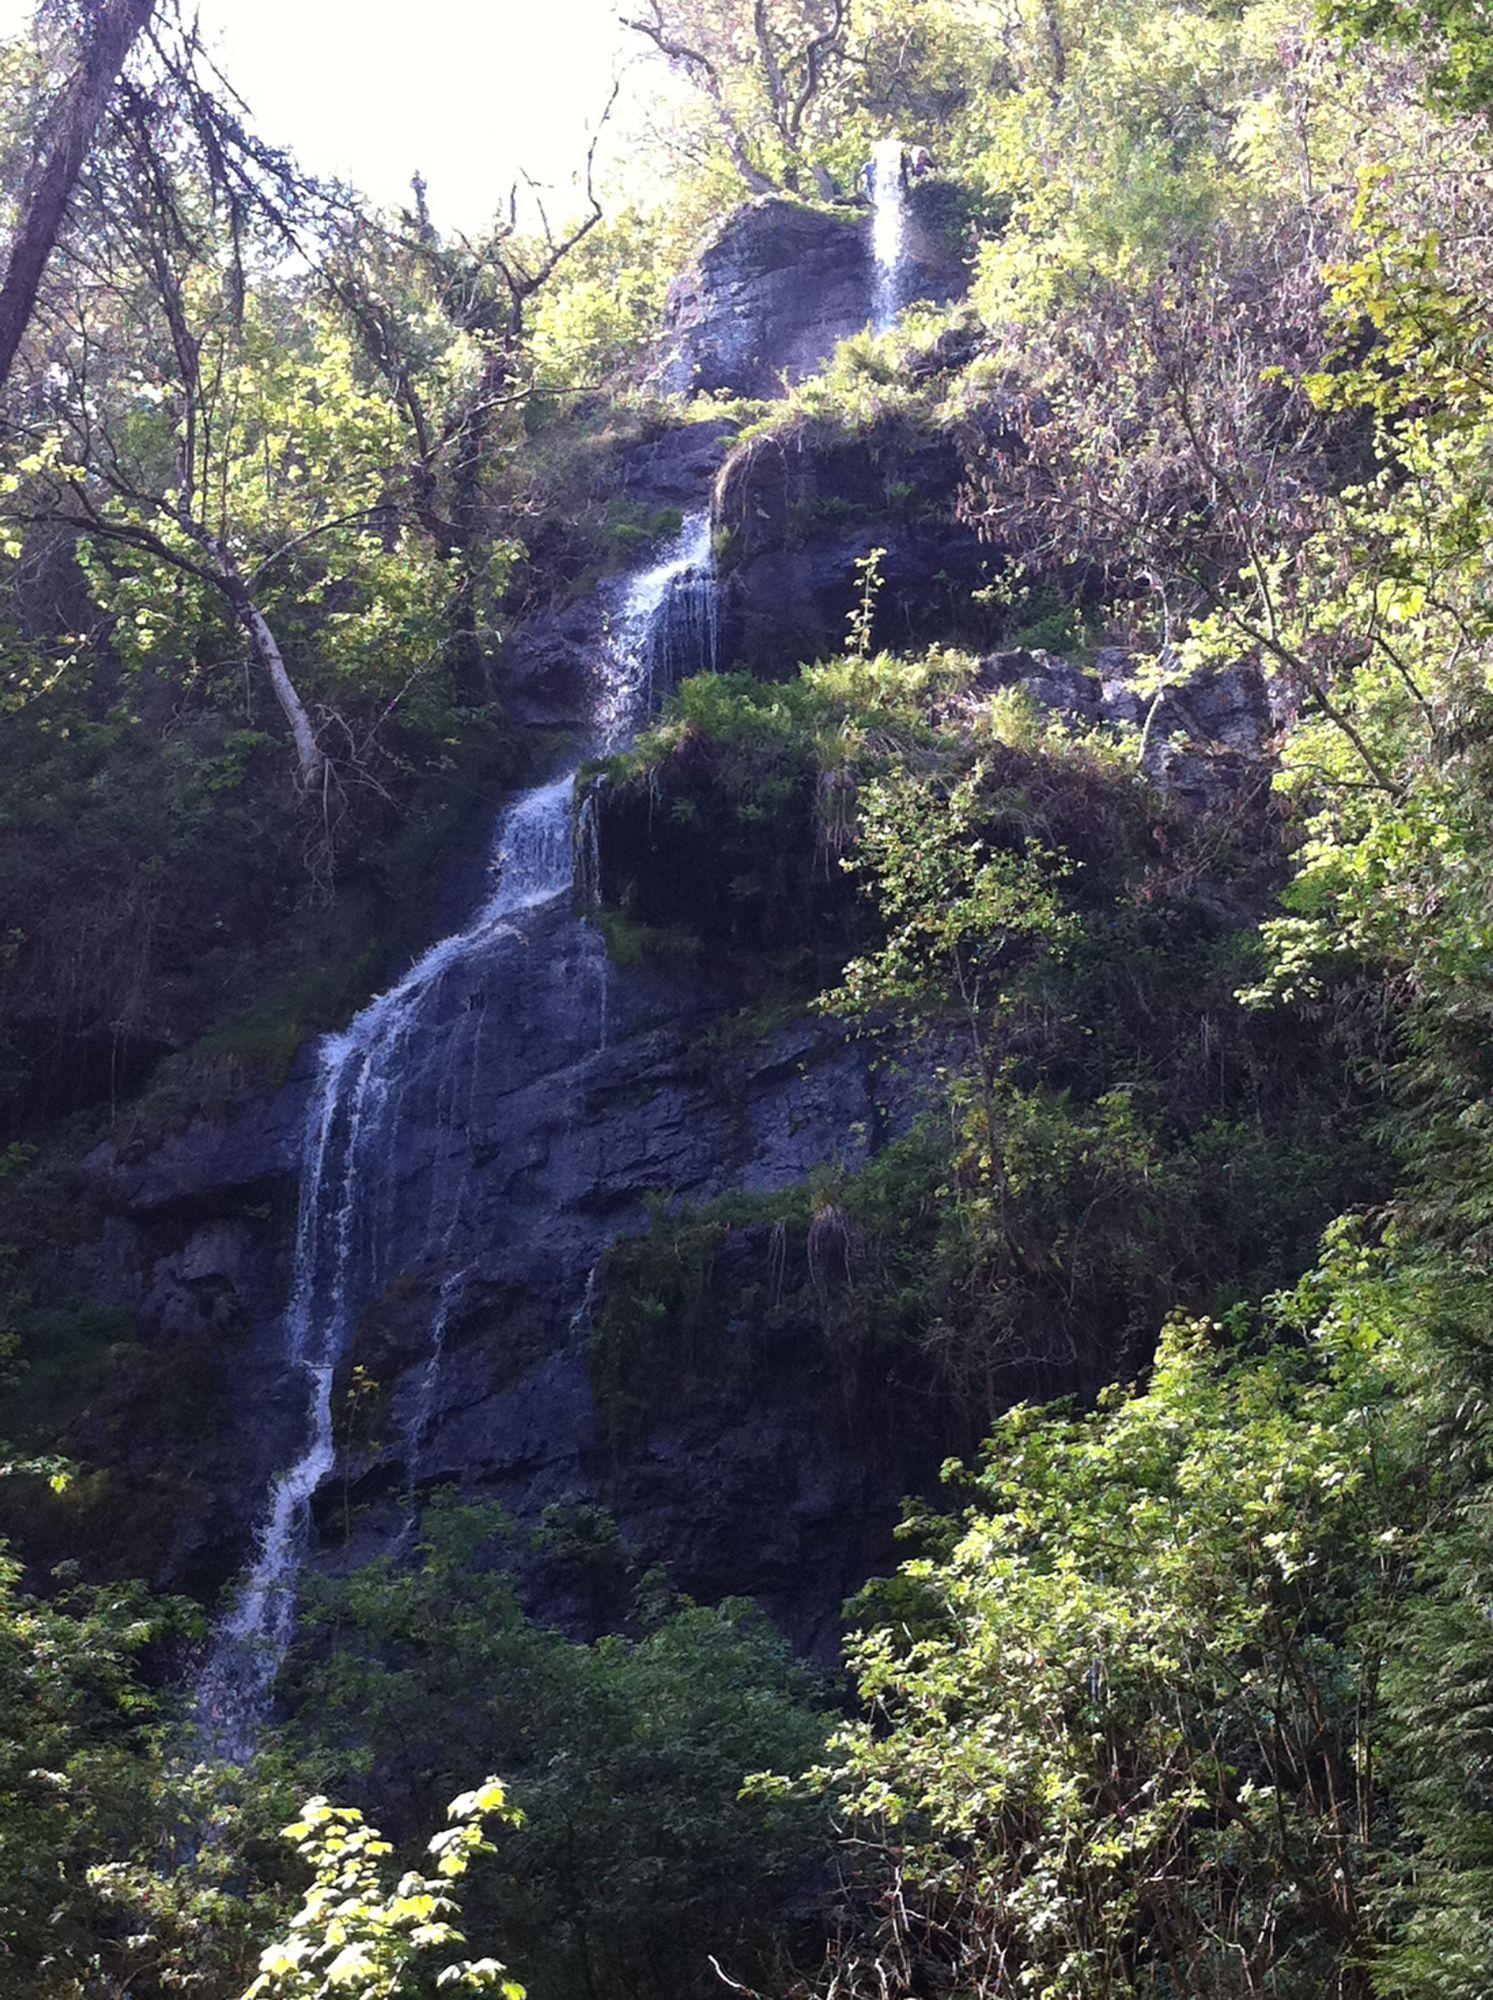 free stock photo waterfall Wales travel nature UK beauty trees